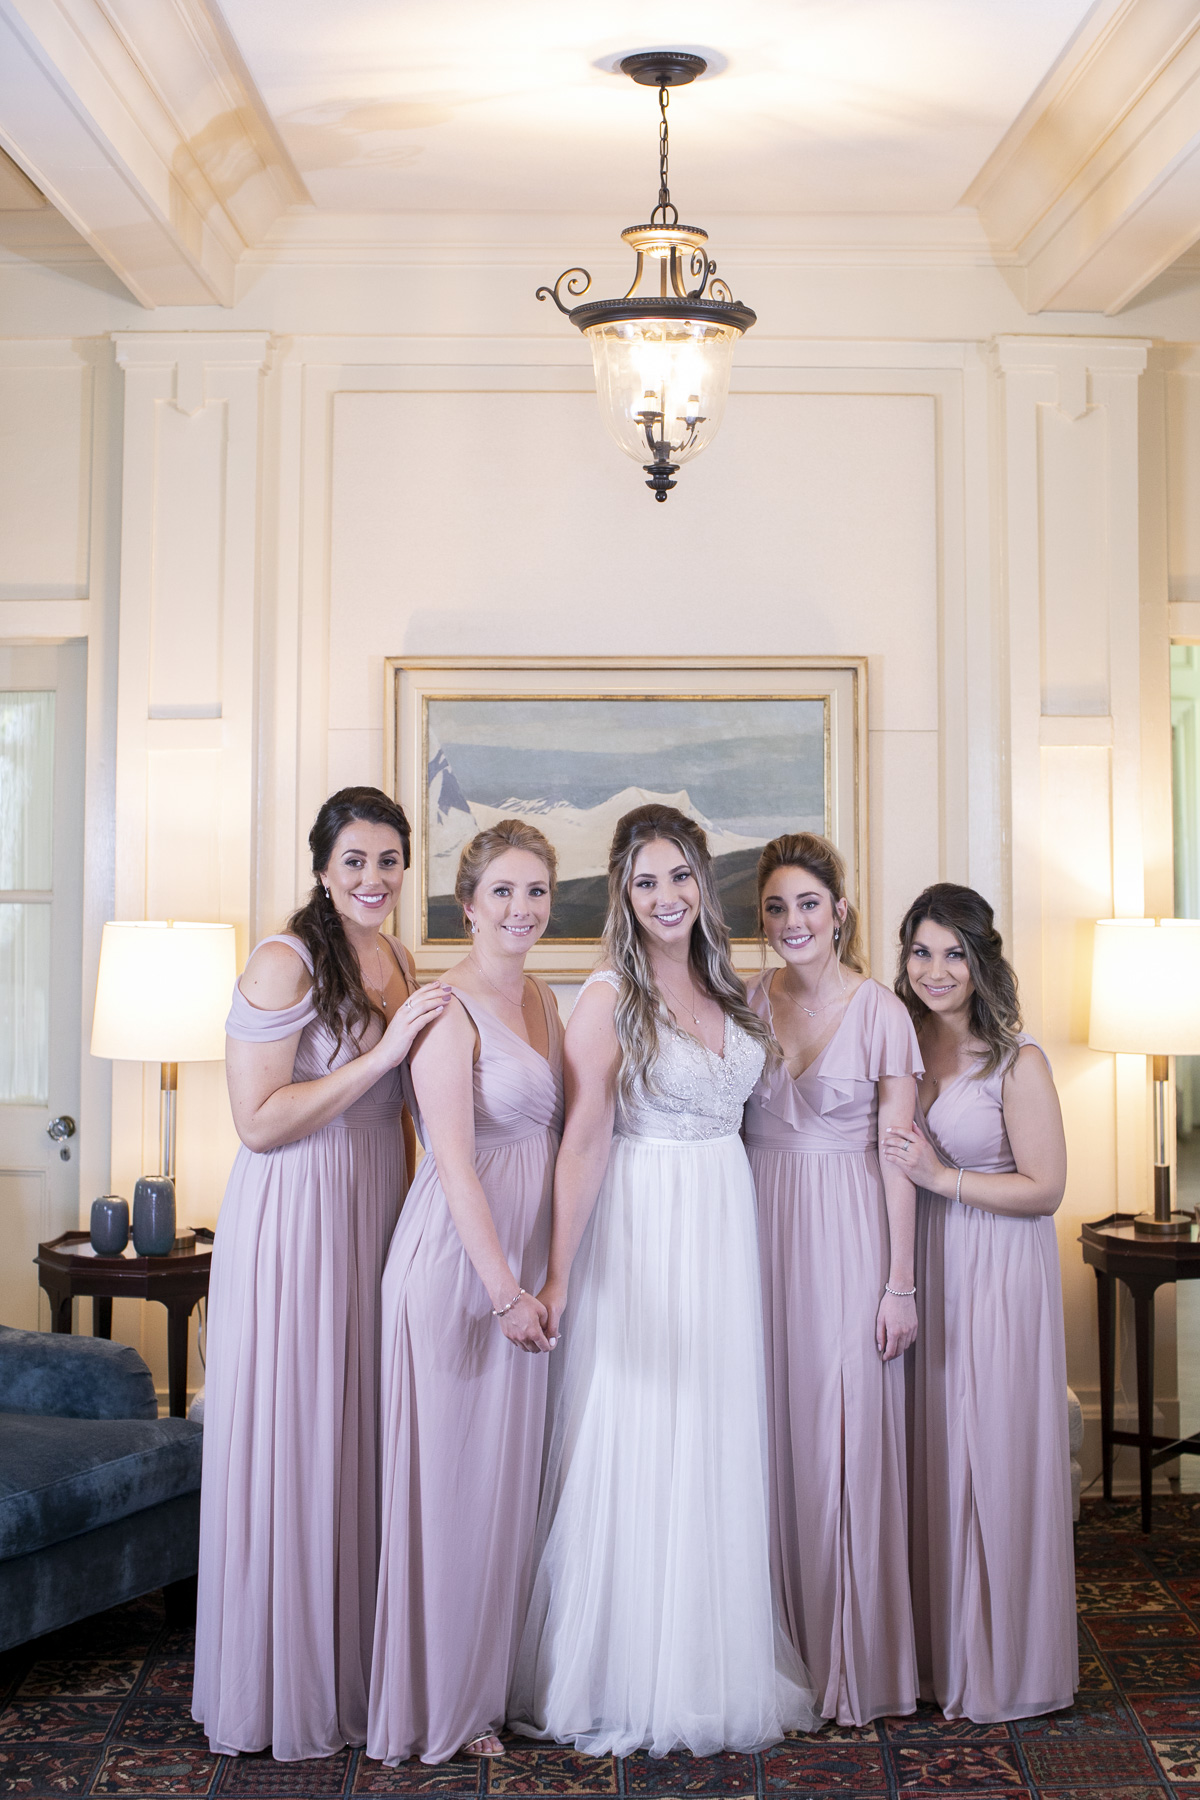 vineyard-bride-philosophy-studios-outdoor-summer-wedding-the-tamahaac-club-niagara-ancaster-toronto-vendor-0044.JPG